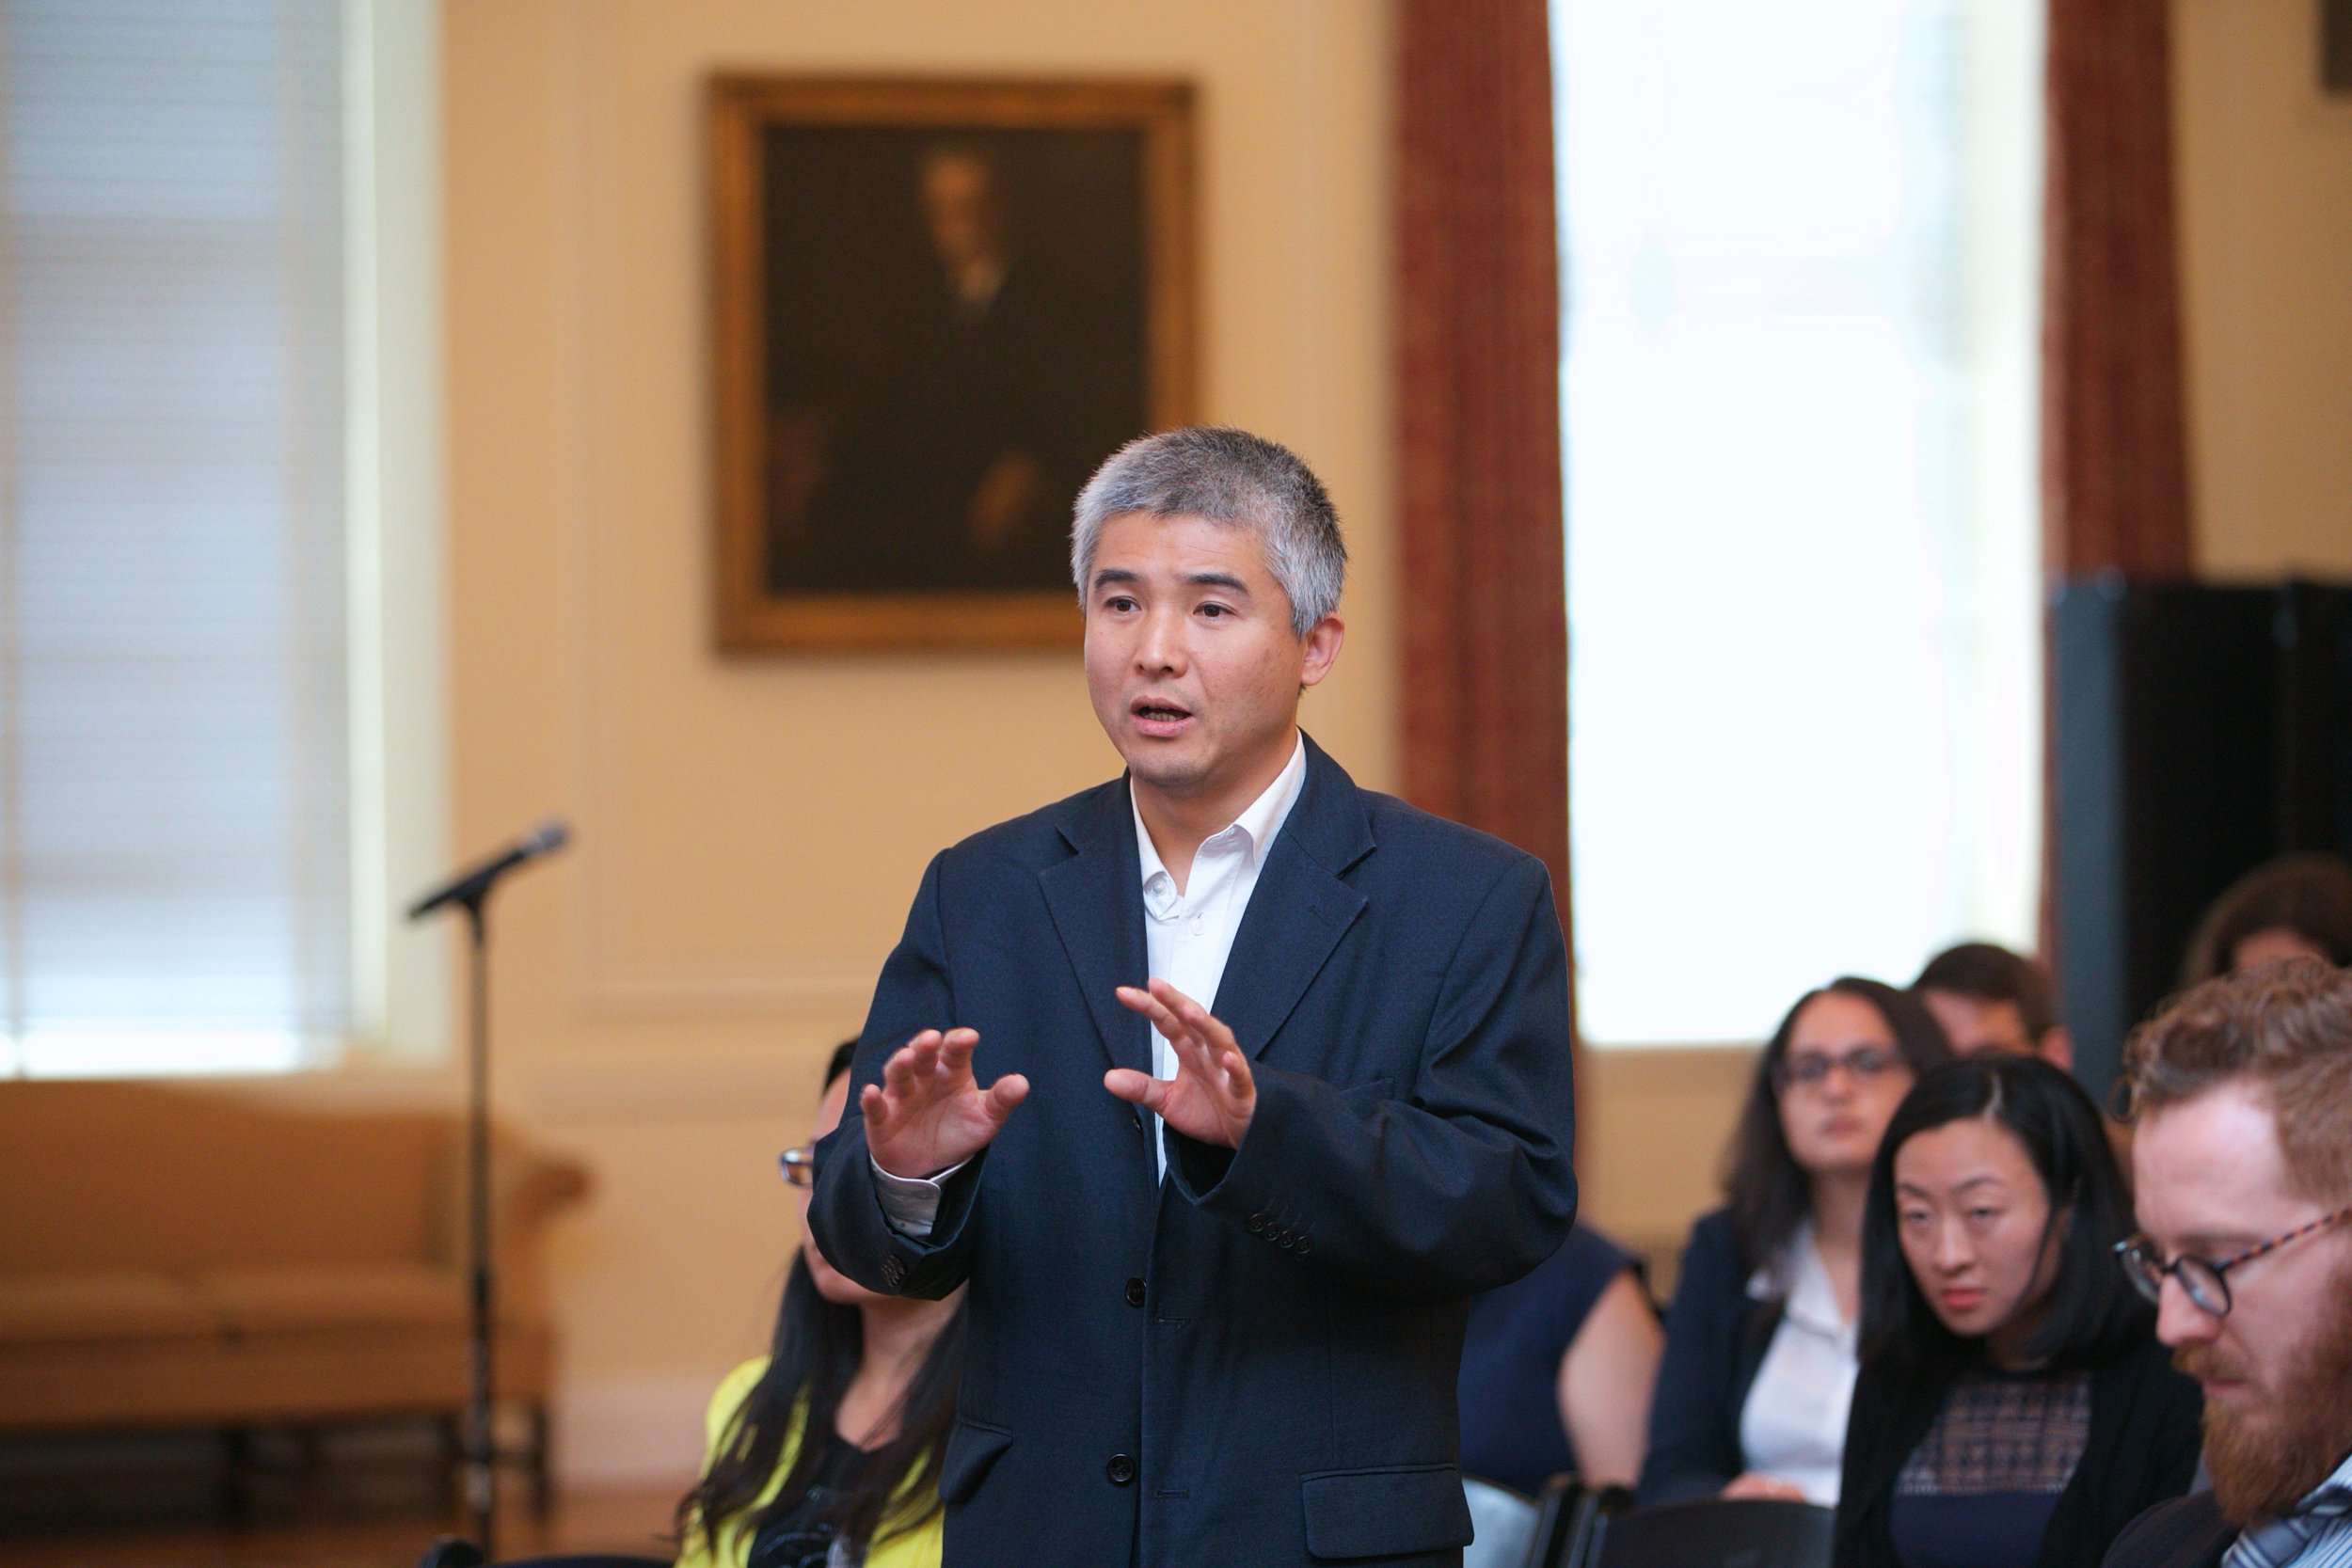 Former USALI Visiting Scholar Lu Jun during Q&A